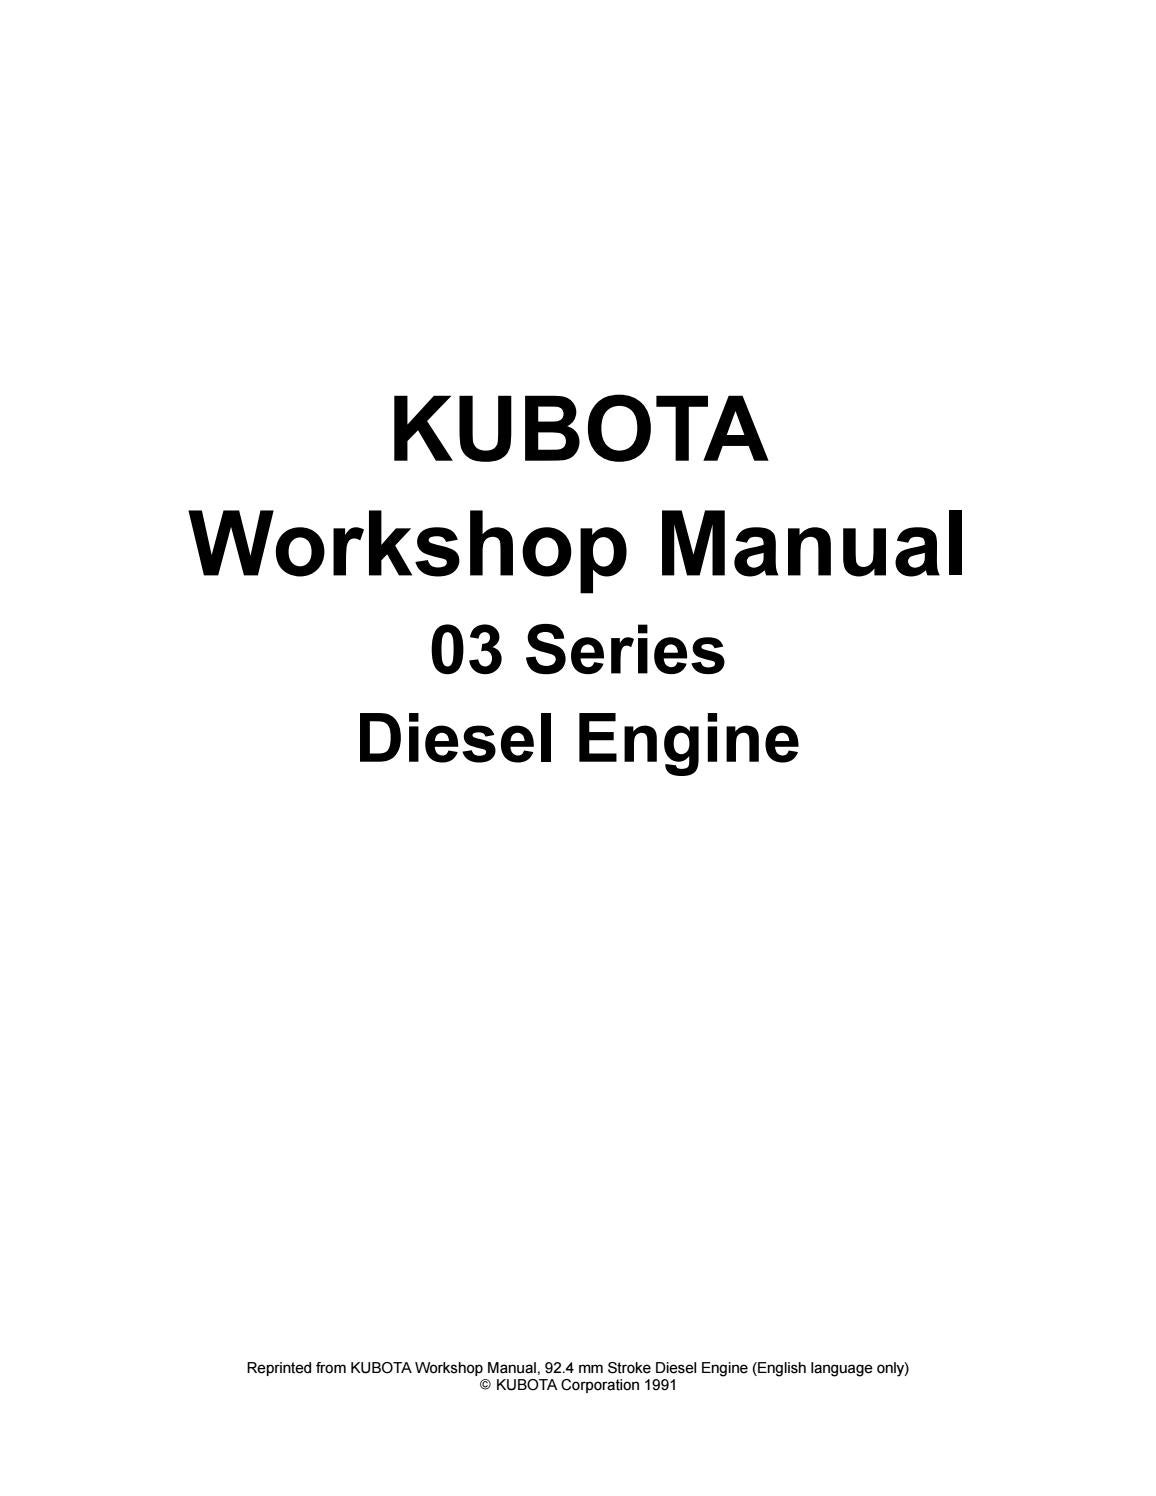 Kubota v1903 b(e) diesel engine service repair manual by